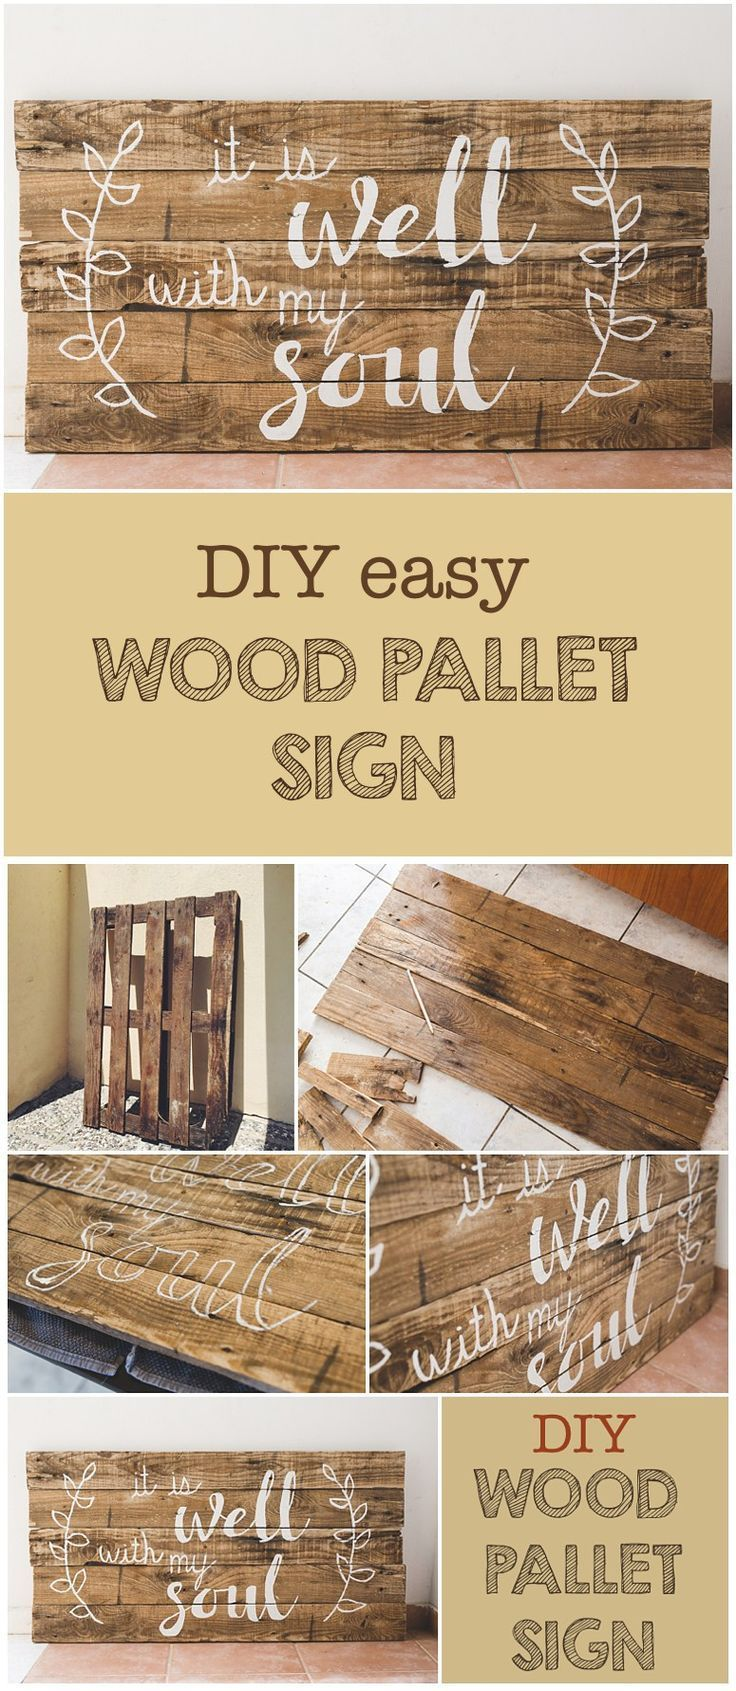 DIY Wood Pallet Sign AND free printable